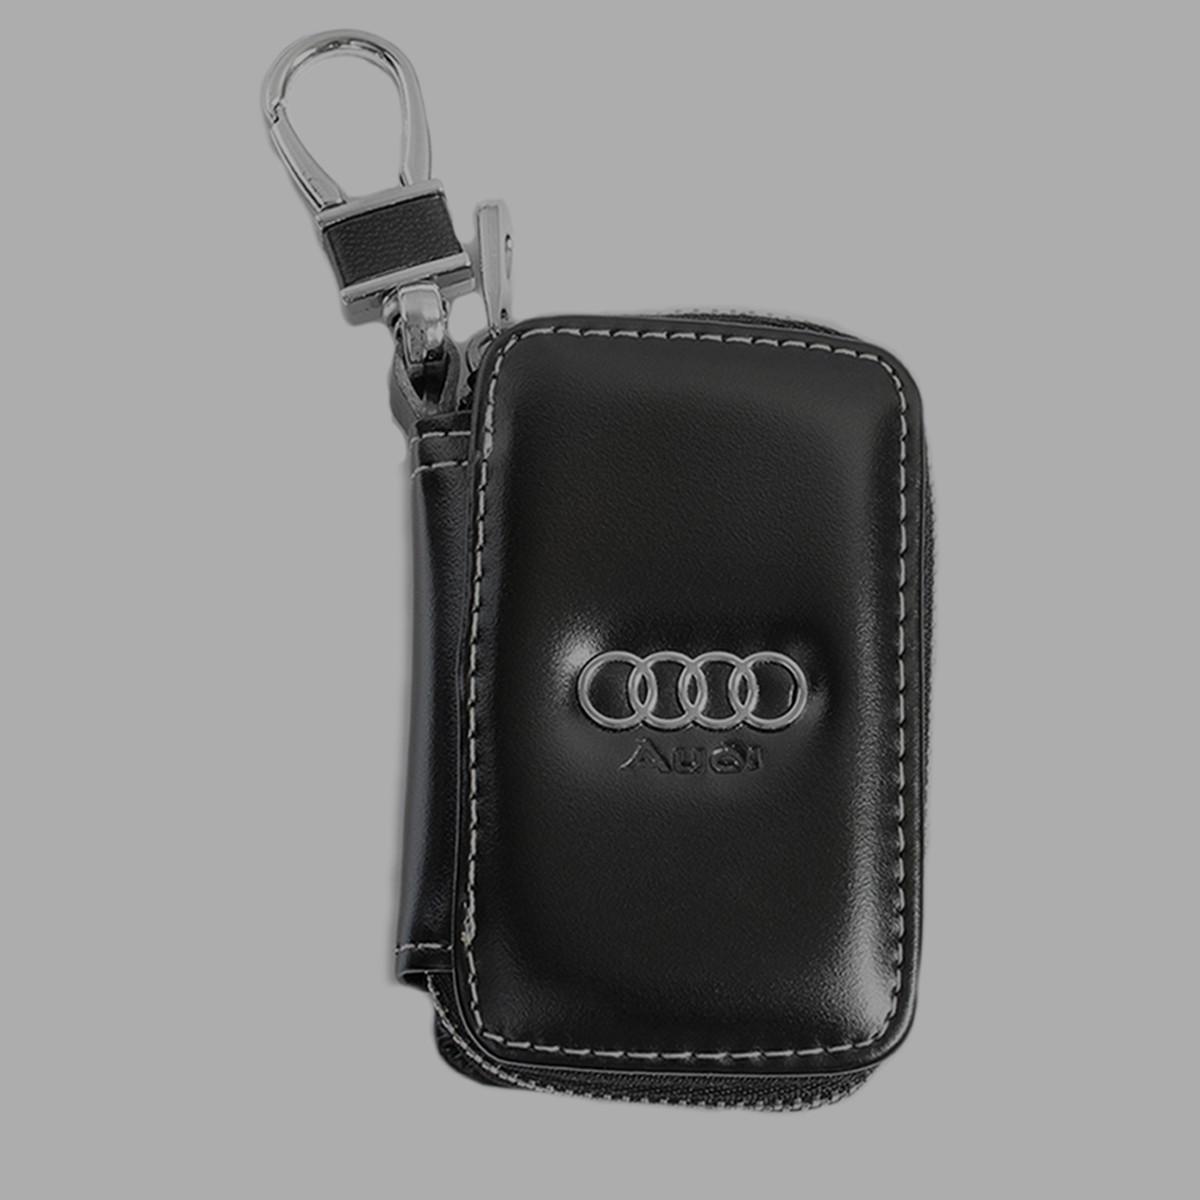 Ключница Carss с логотипом AUDI 01011 черная